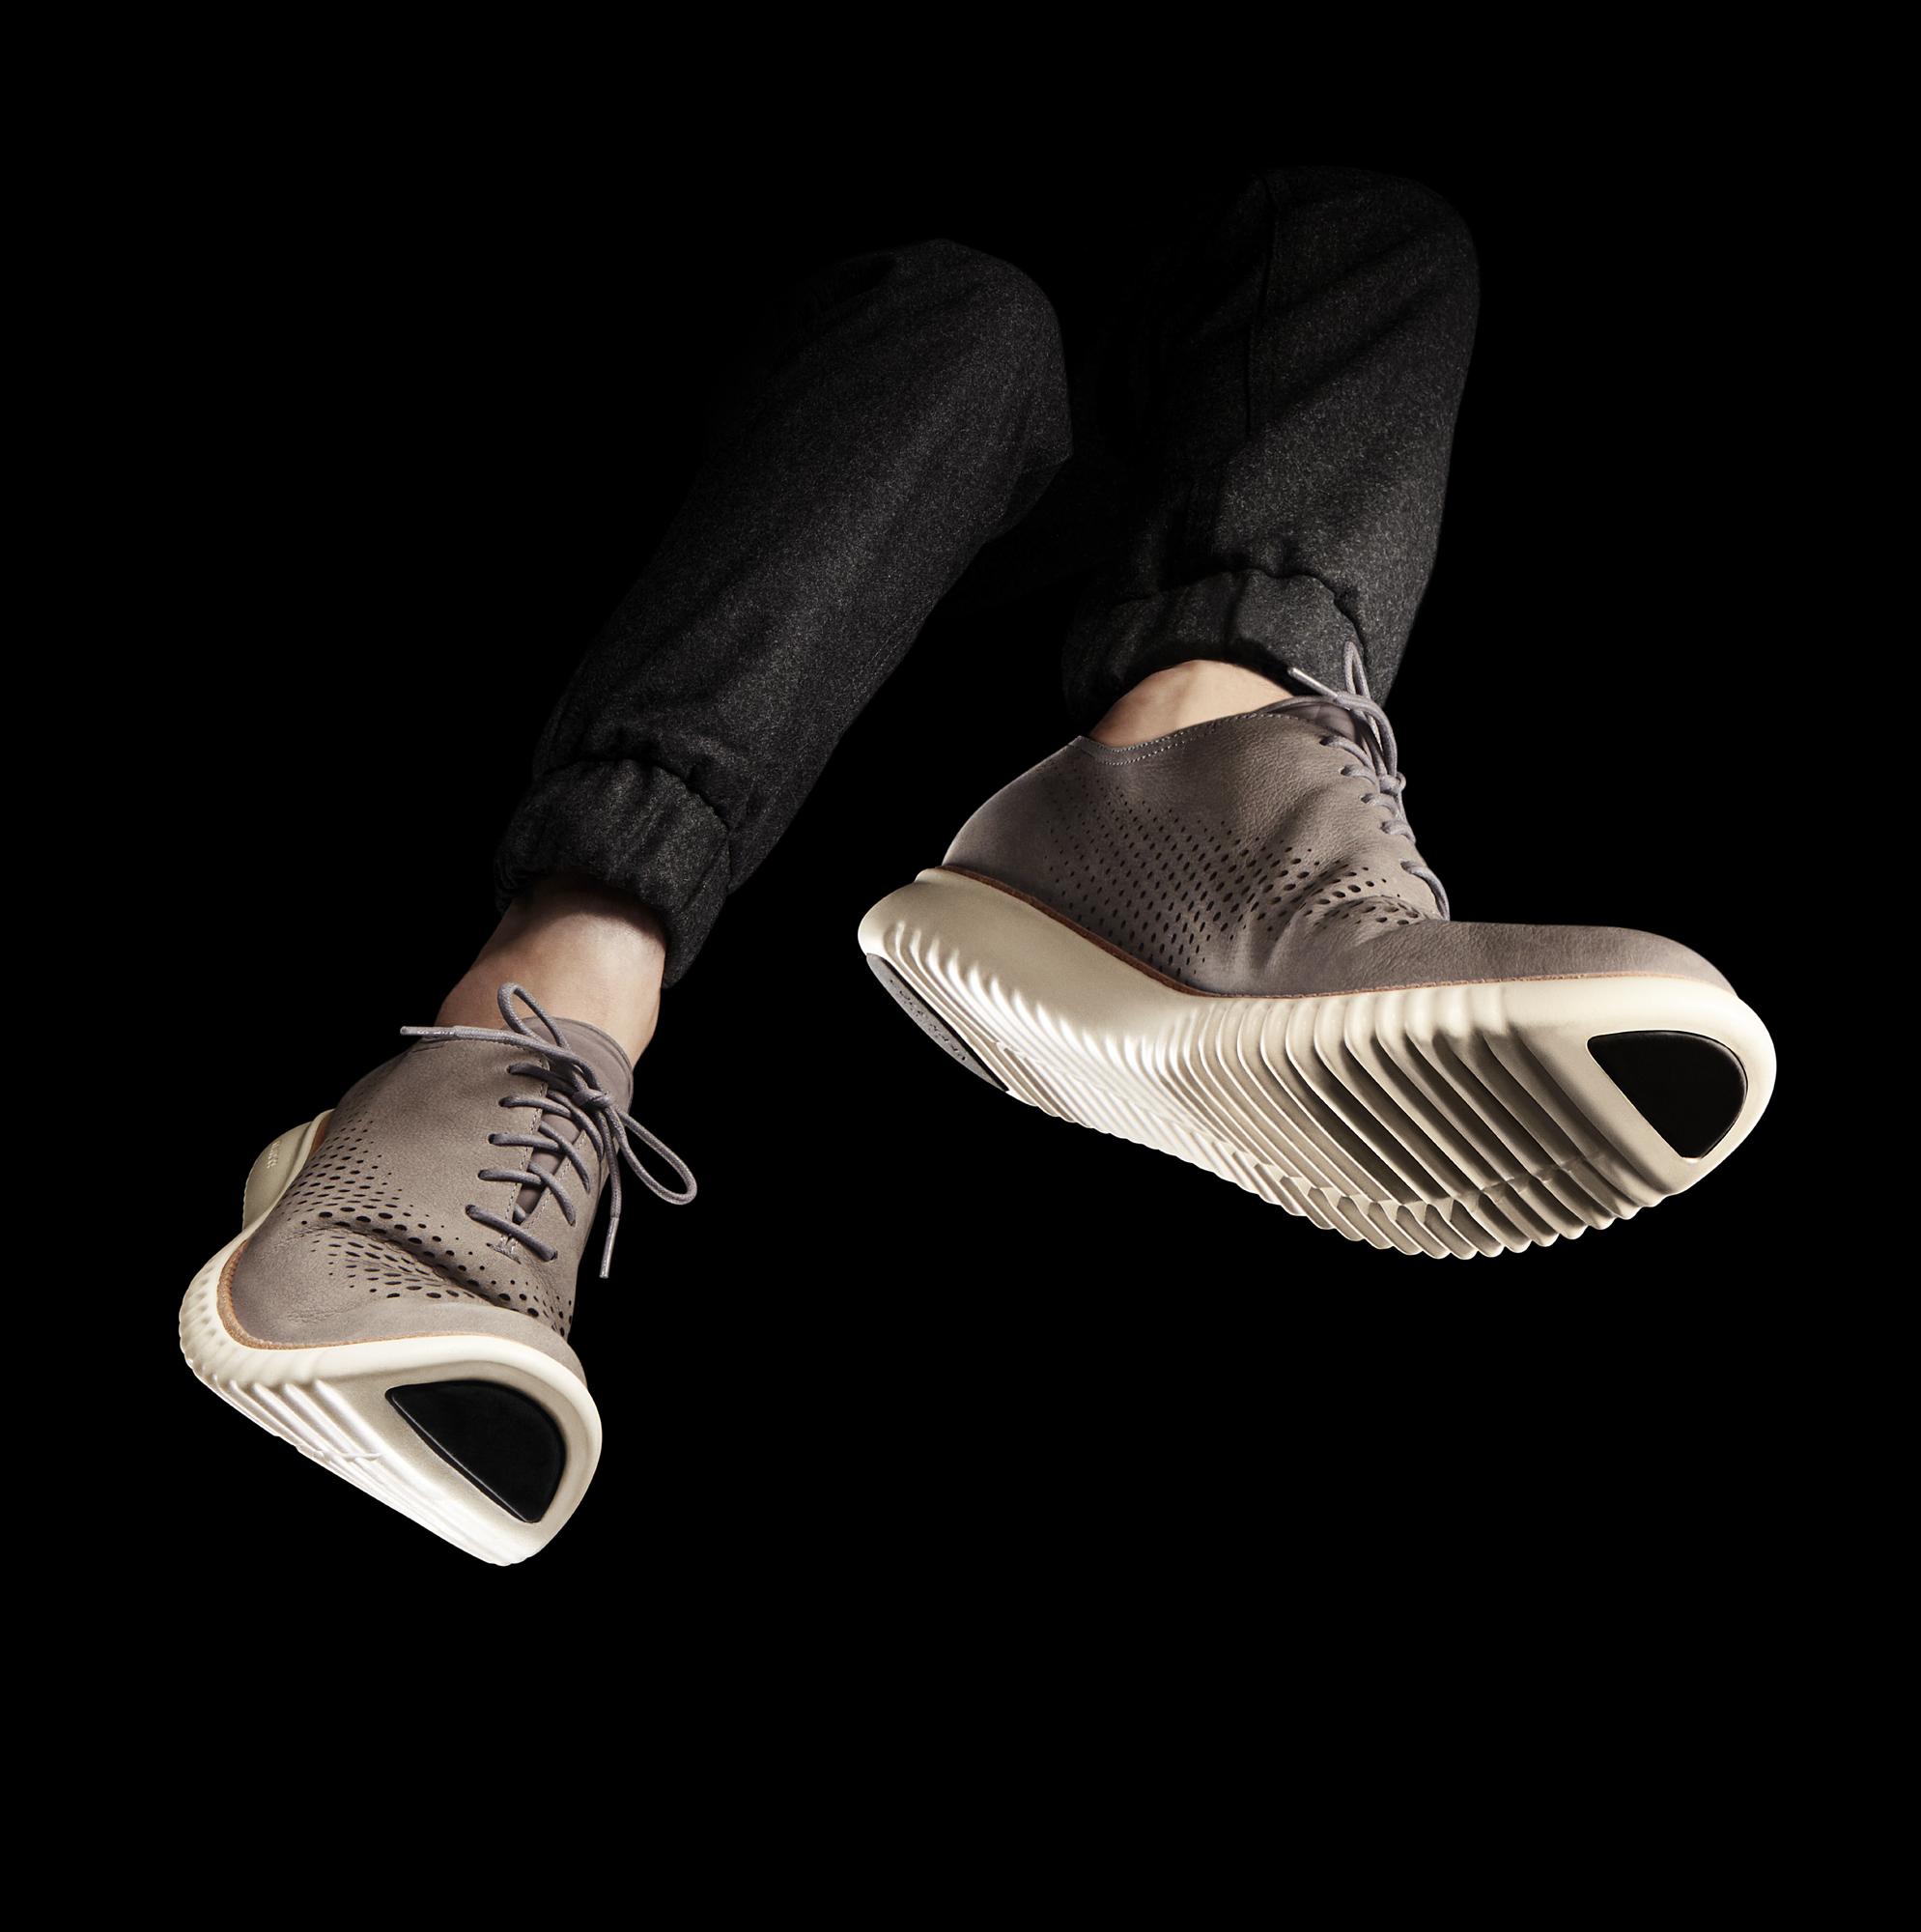 Cole Haan Fall 2016 – Men's 2.ZERØGRAND Laser Wingtip Oxford – Ironstone/Ivory